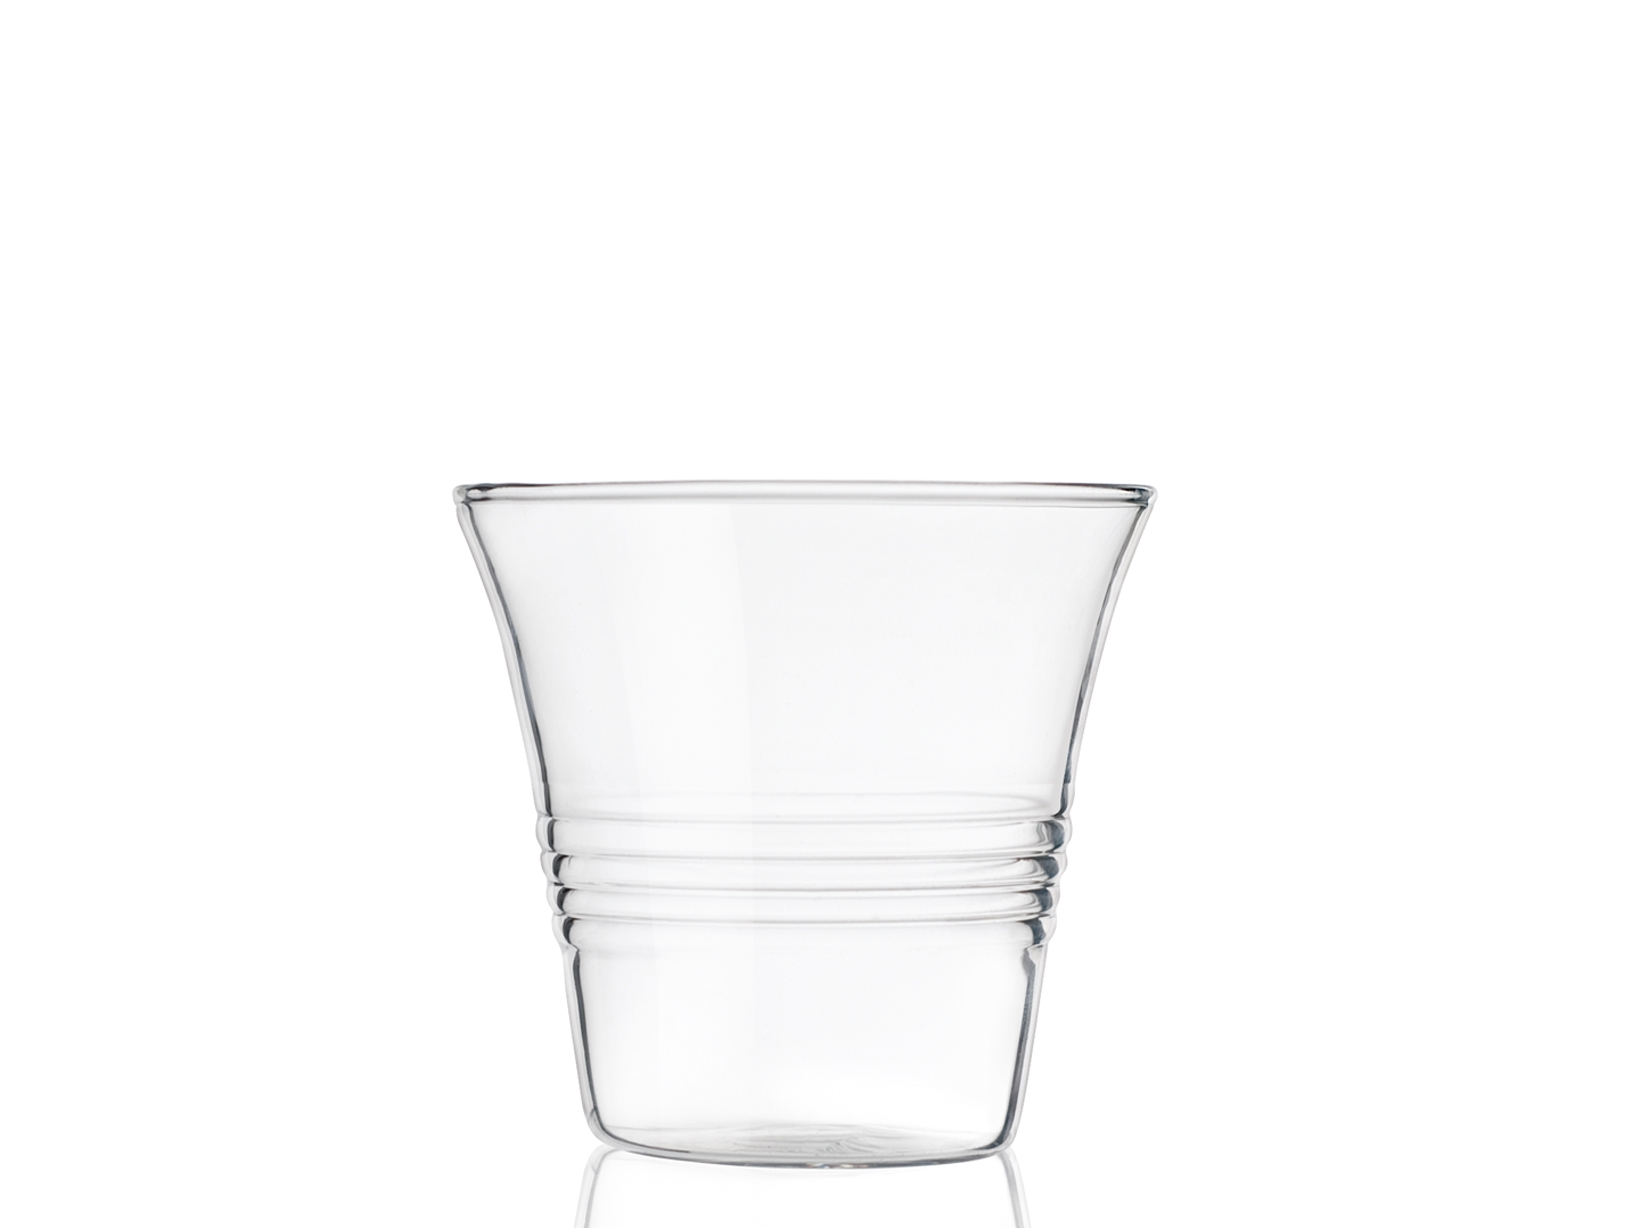 Set 4 Bicchieri In Borosilicato, 100 Ml, Trasparente